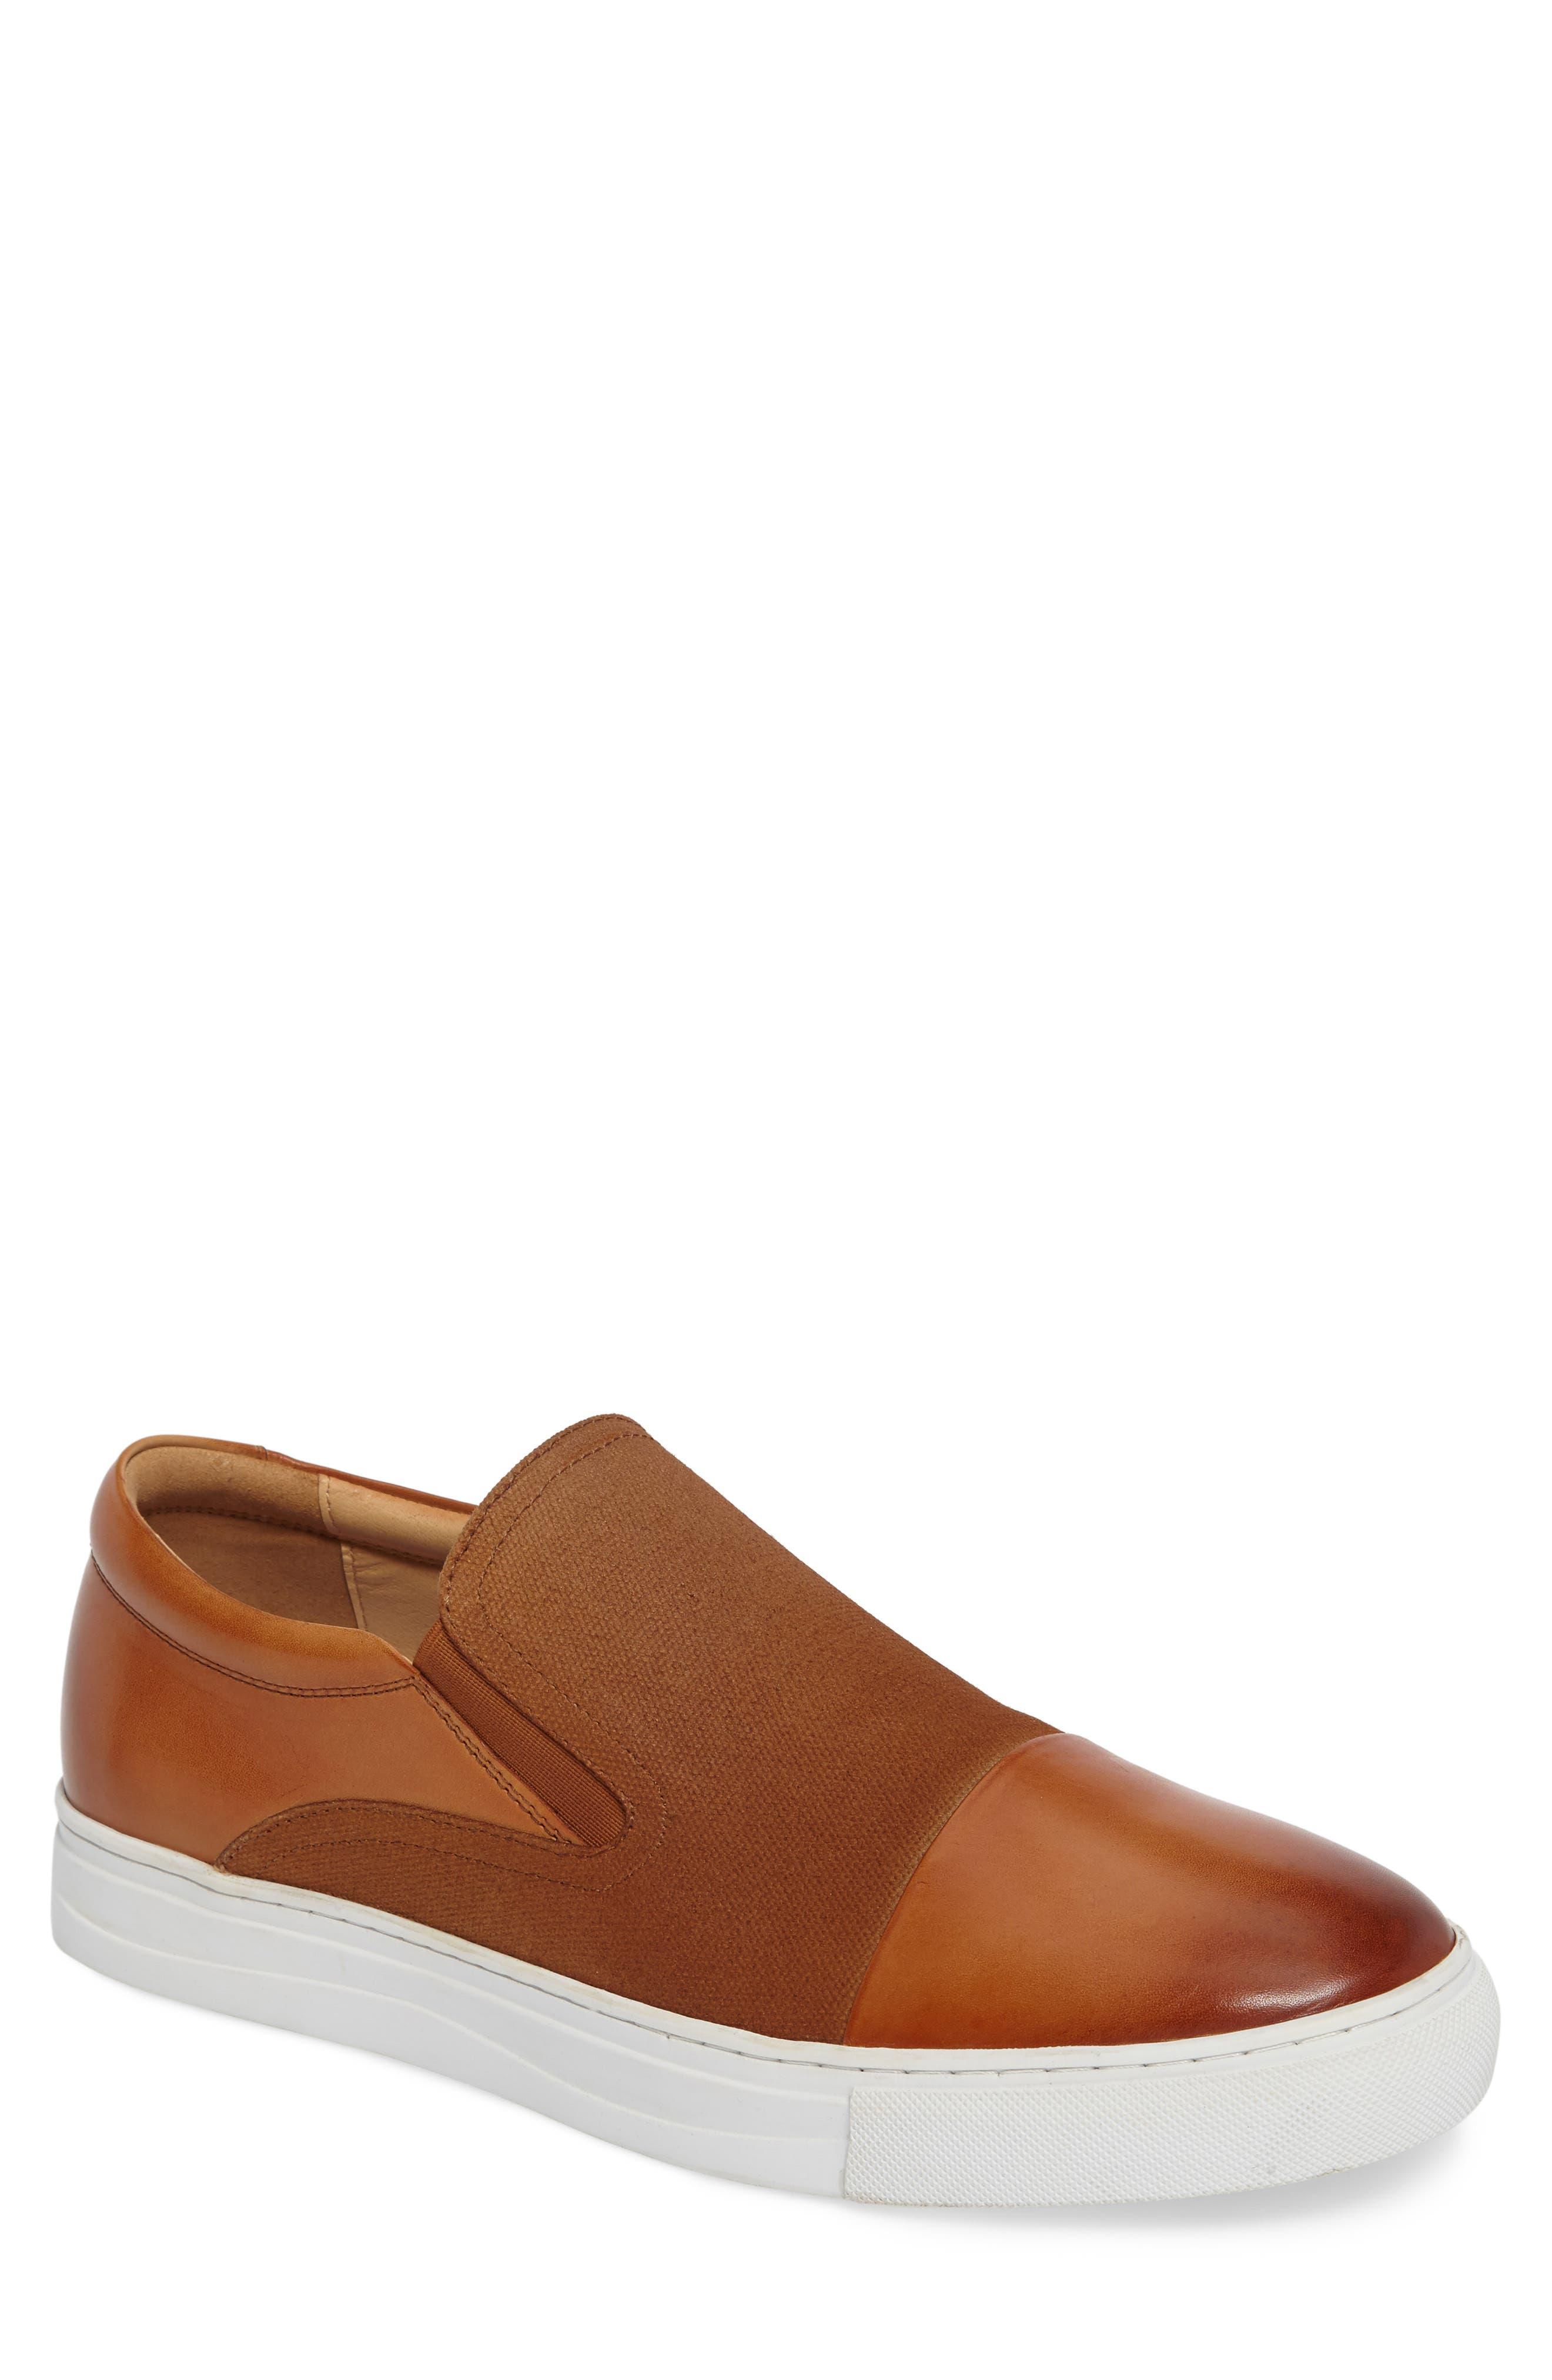 Gants Slip-On,                         Main,                         color, Cognac